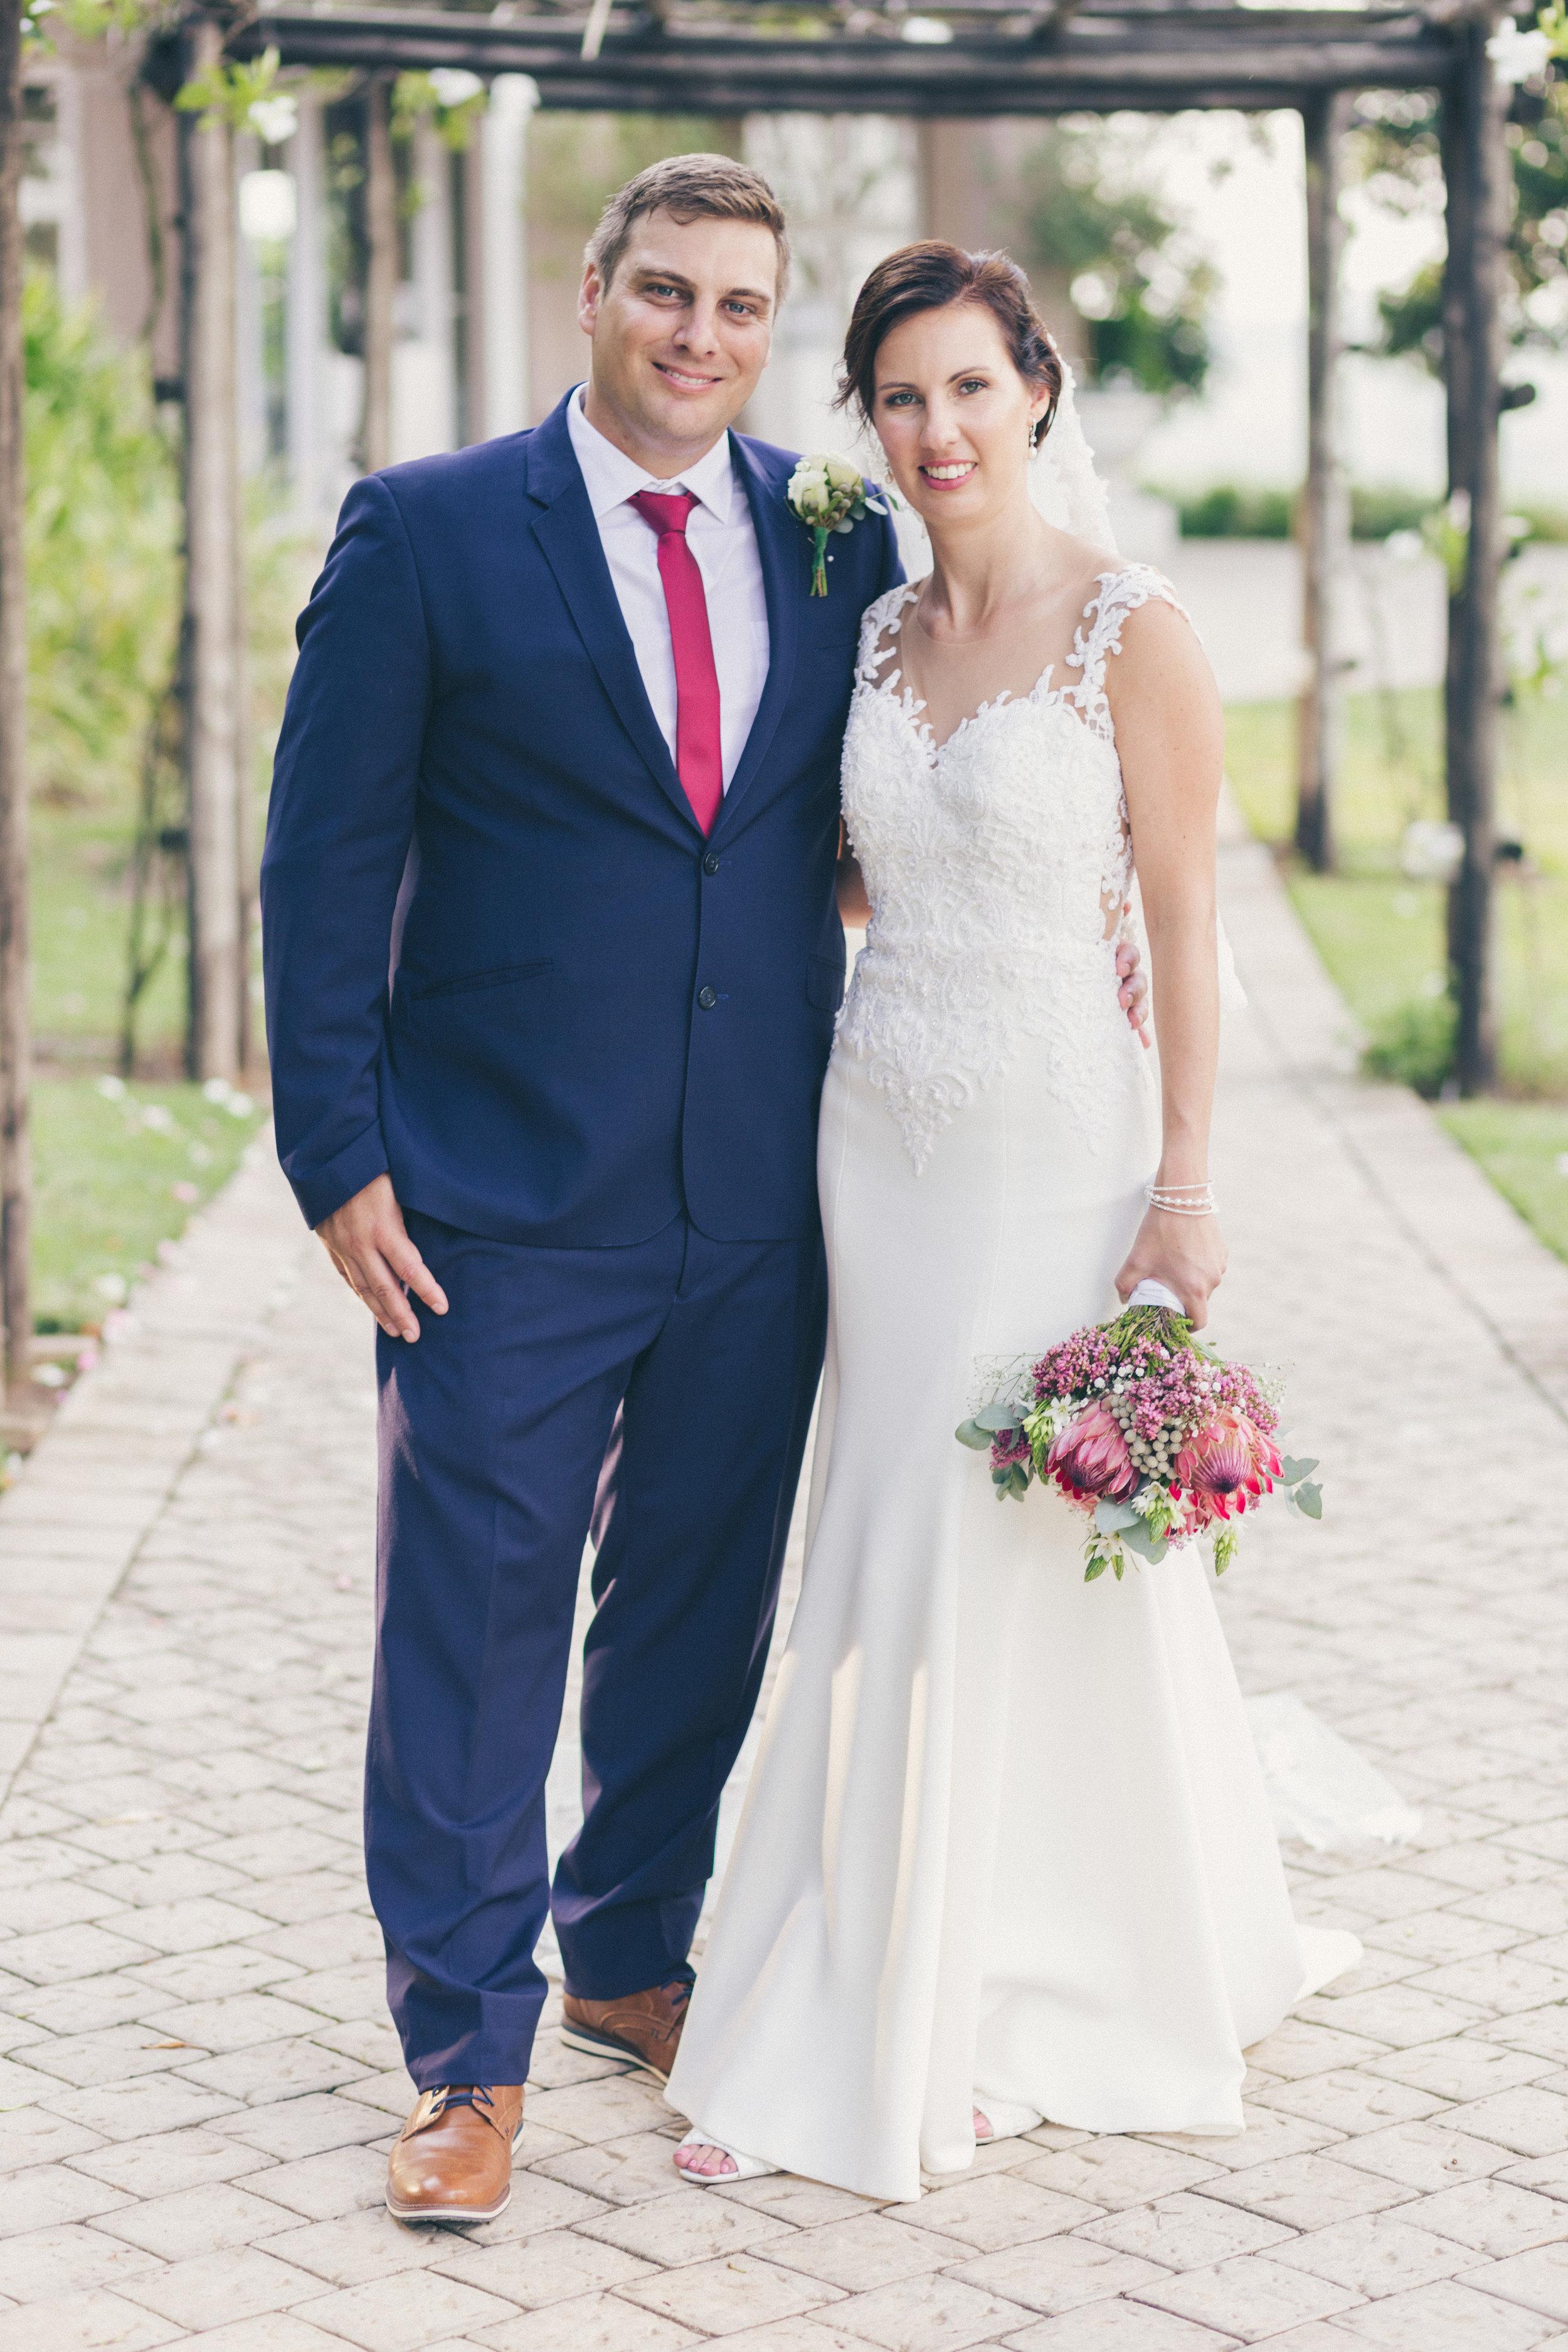 Liezl & Rudy Wedding-328.jpg